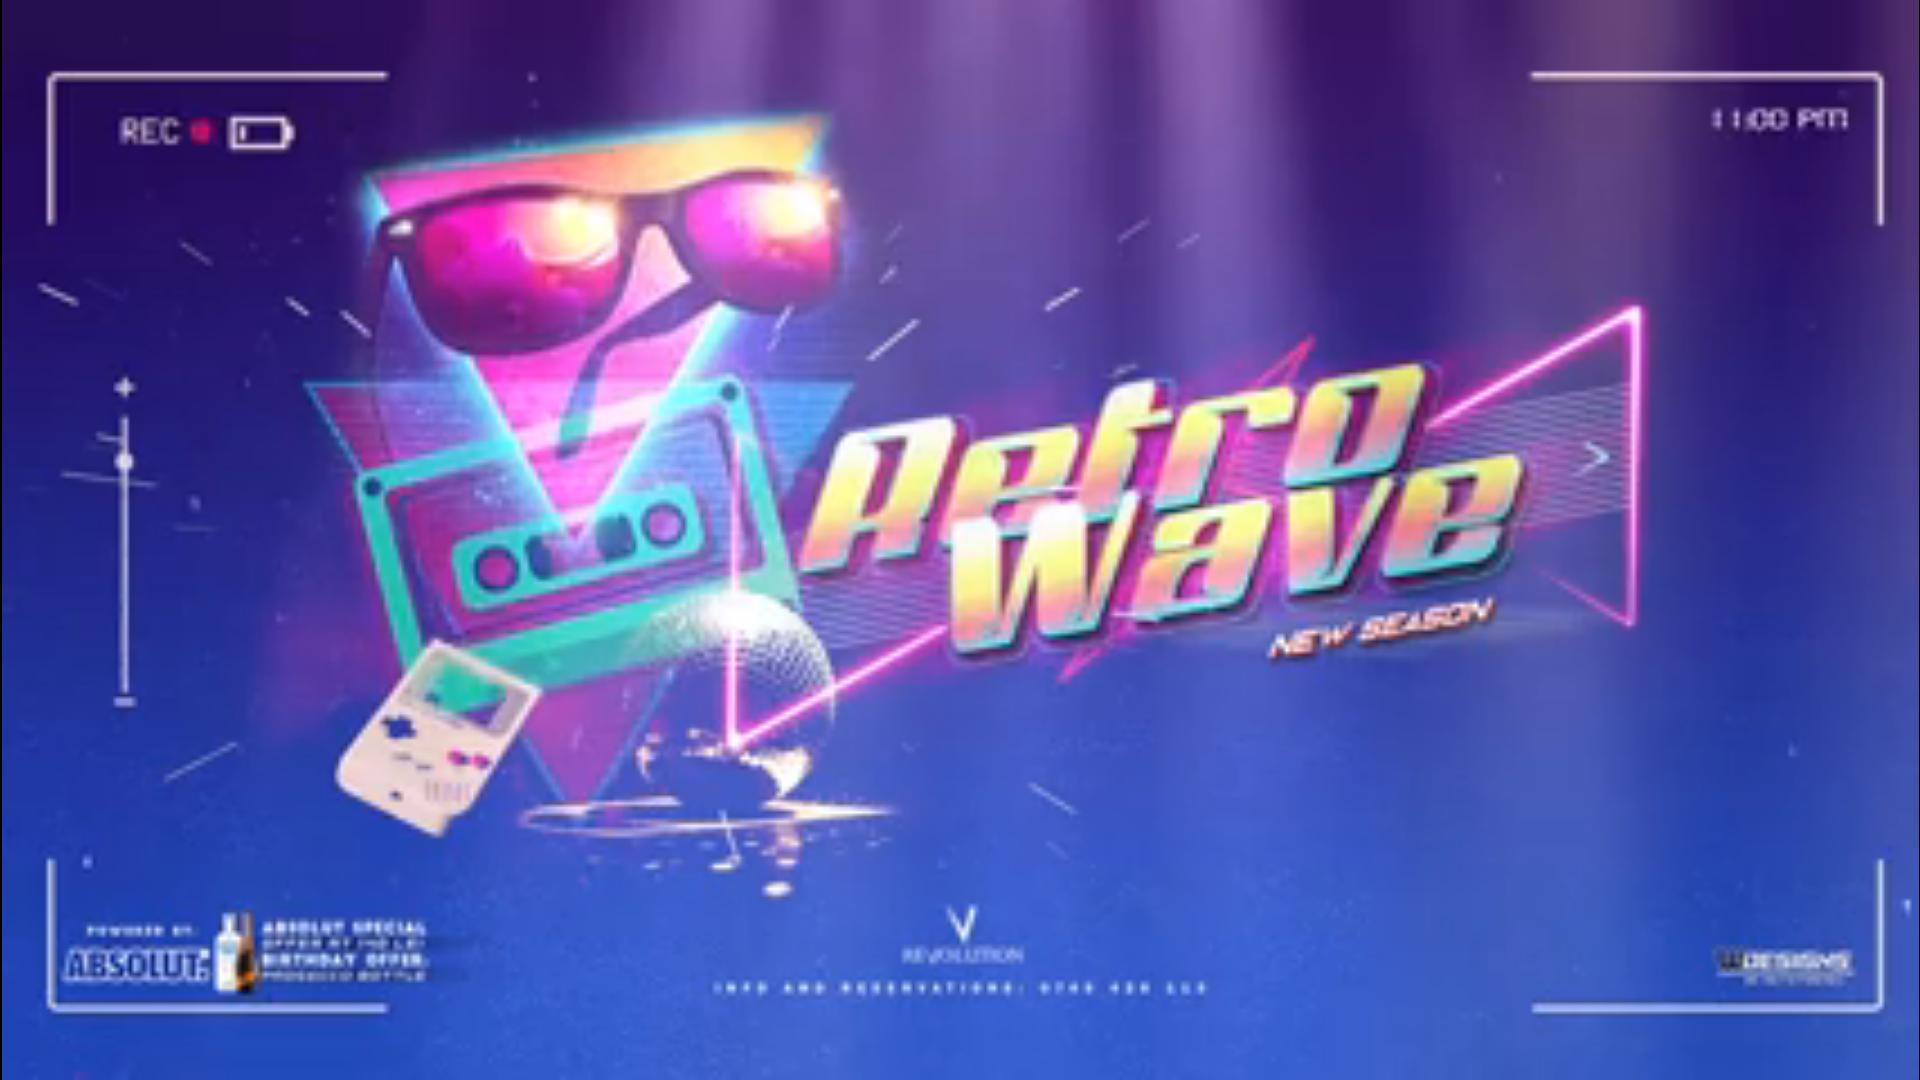 Retro Wave – Friday Night Kitsch Music